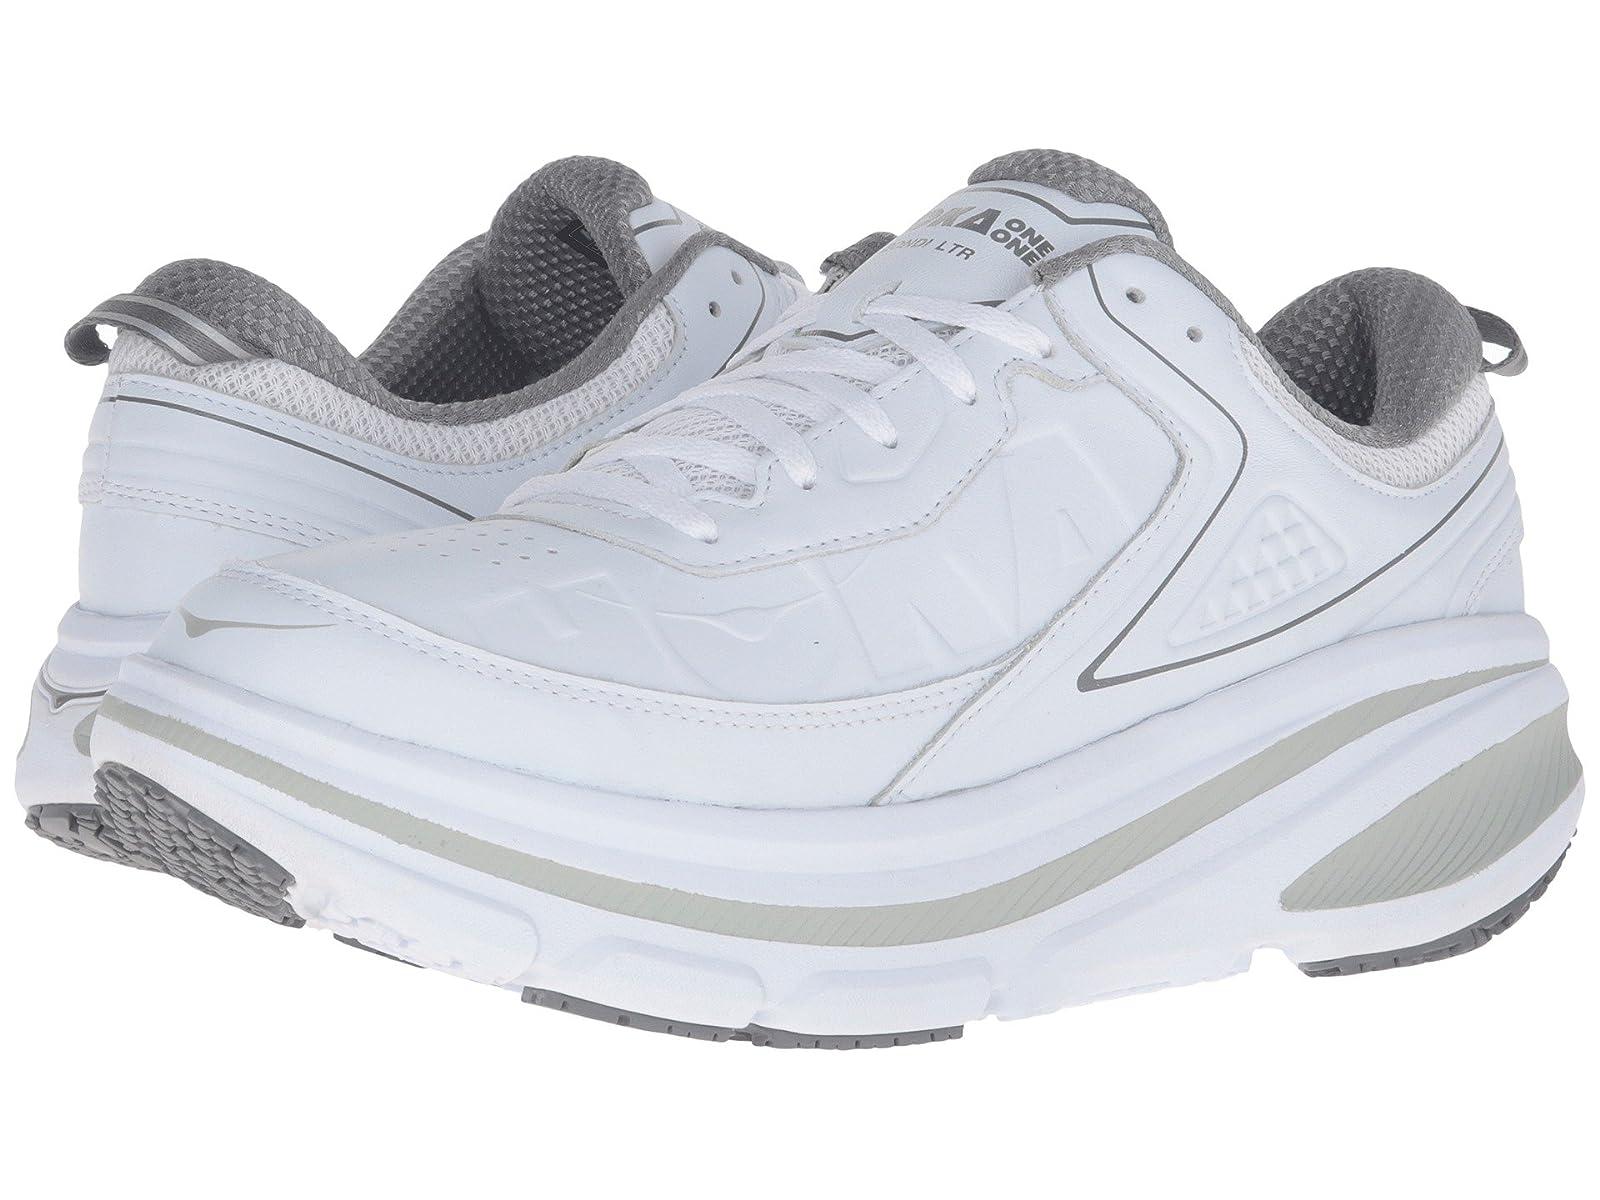 Hoka One One Bondi LTRAtmospheric grades have affordable shoes